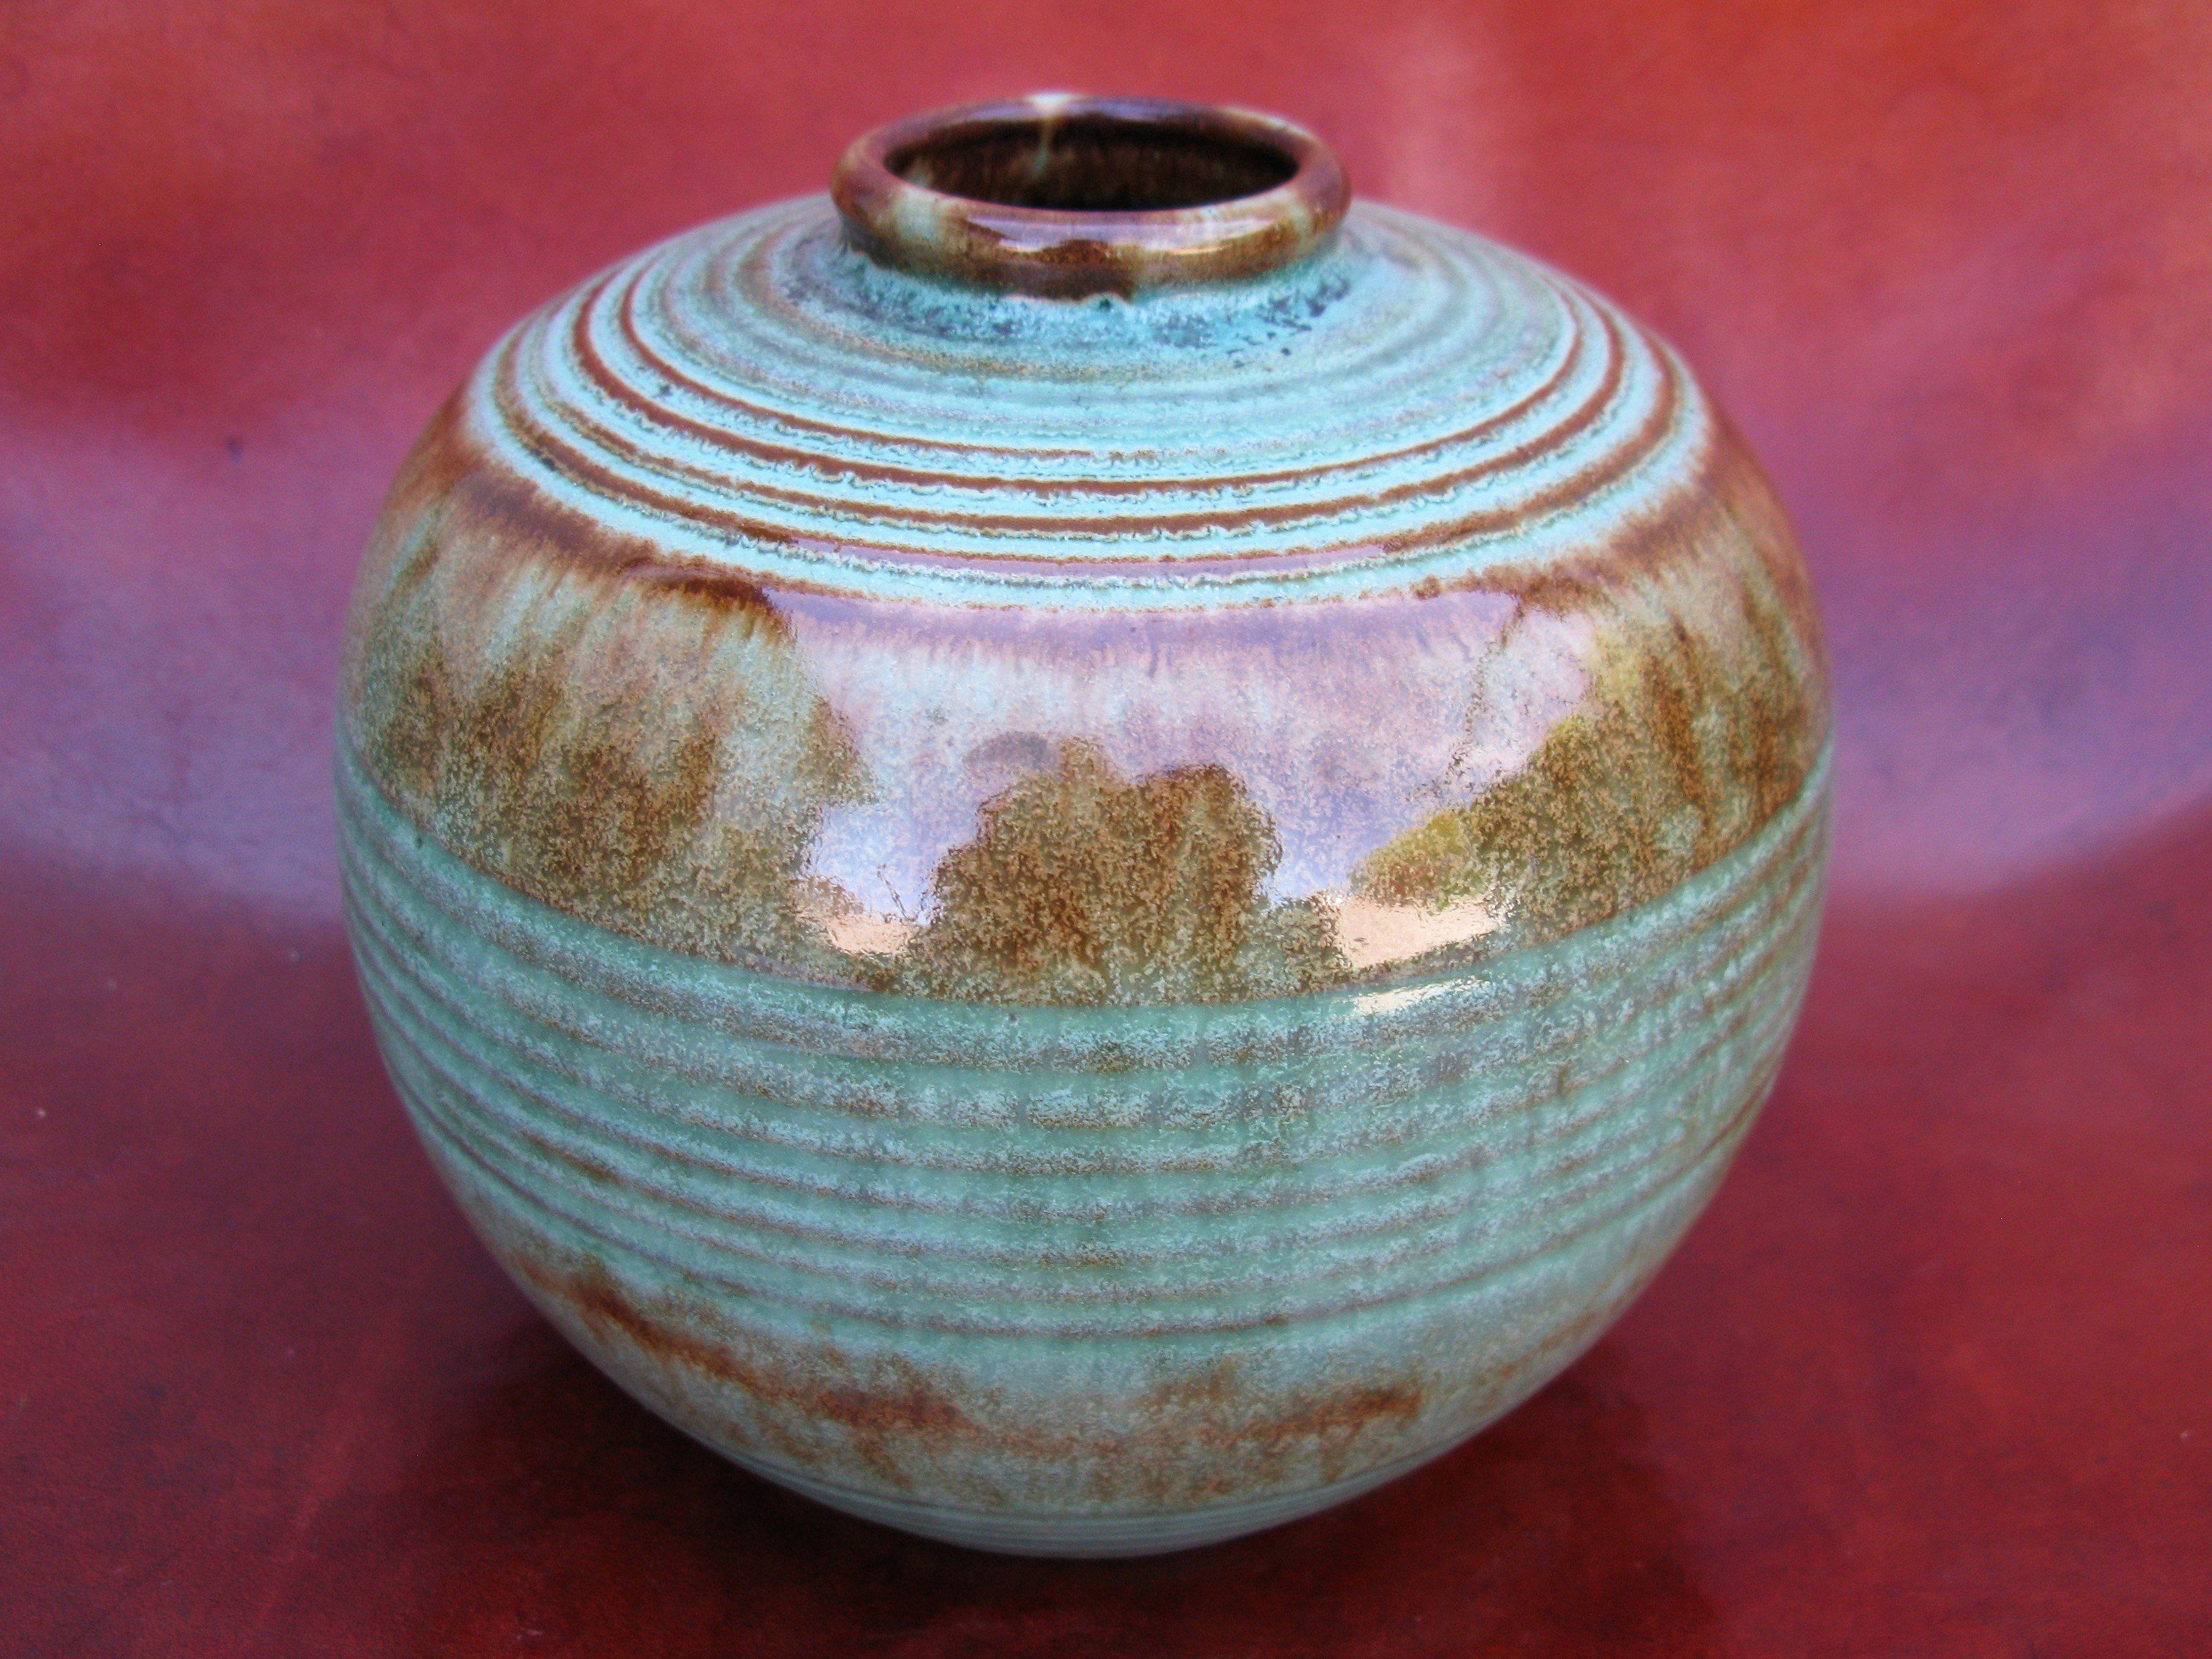 greenish globe vase 3156